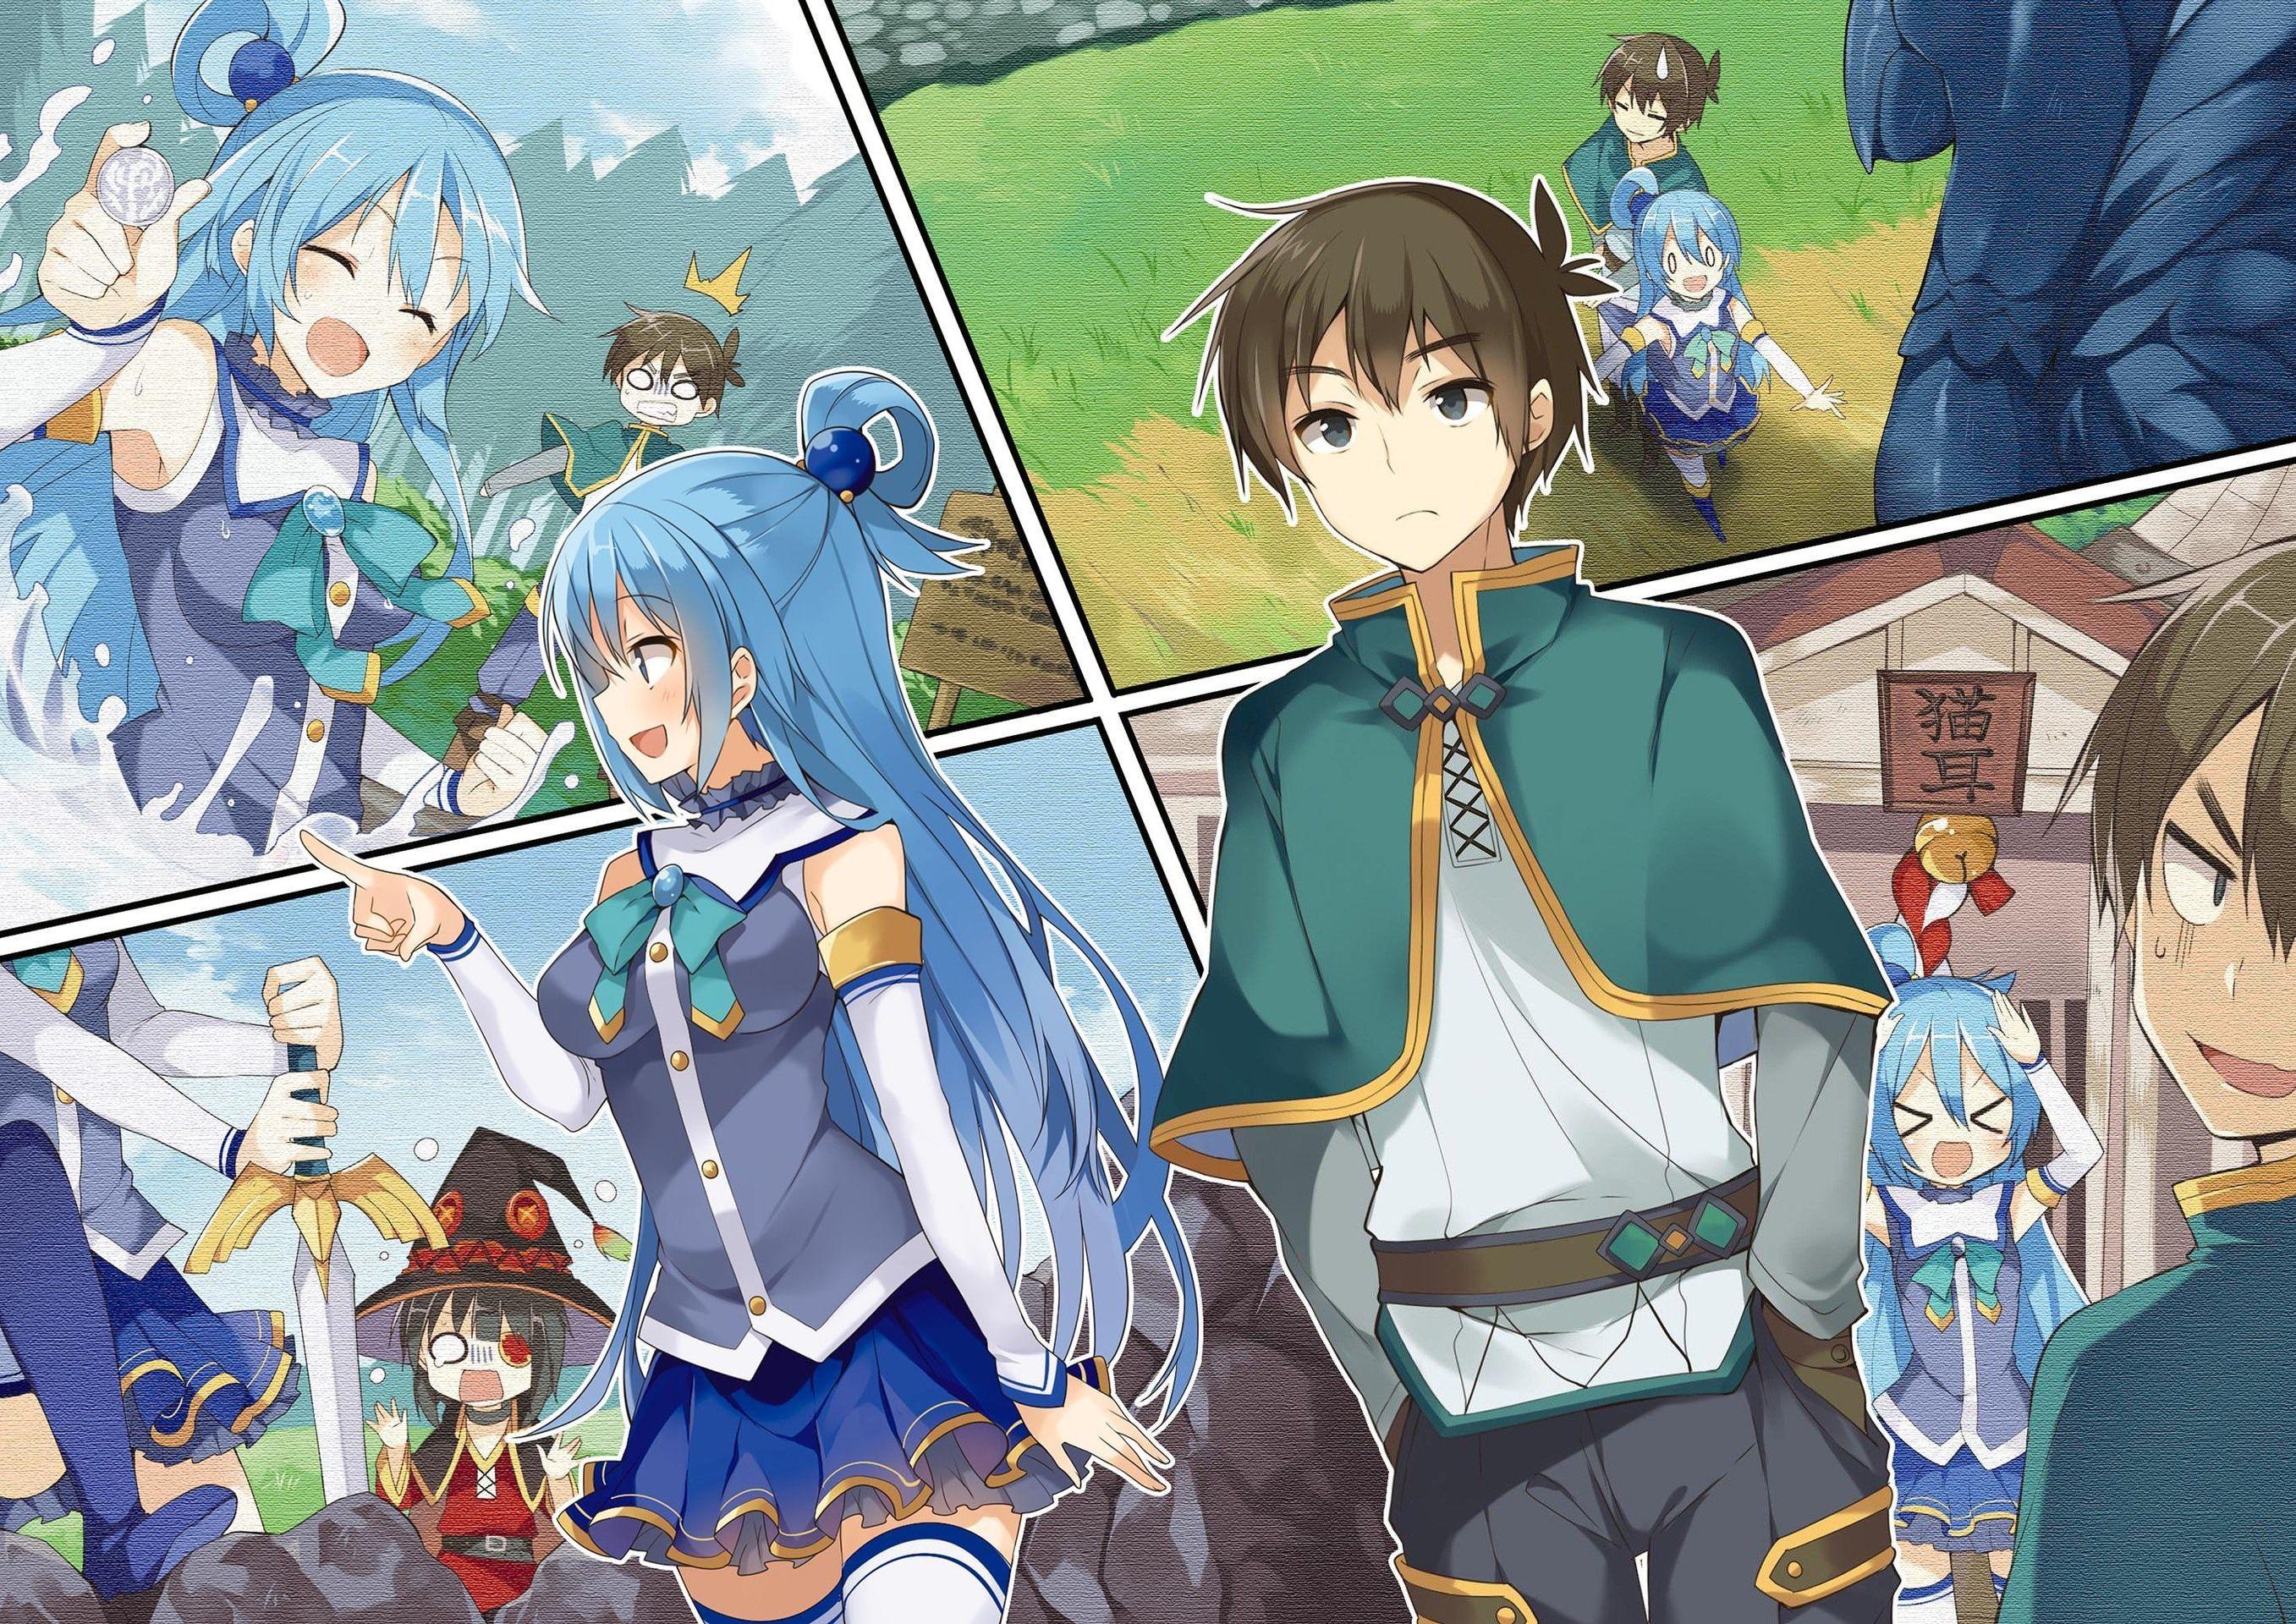 2714x1920 Hd Wallpaper Konosuba Gods Blessing On This Wonderful World Anime Konosuba Foto Na Piscina